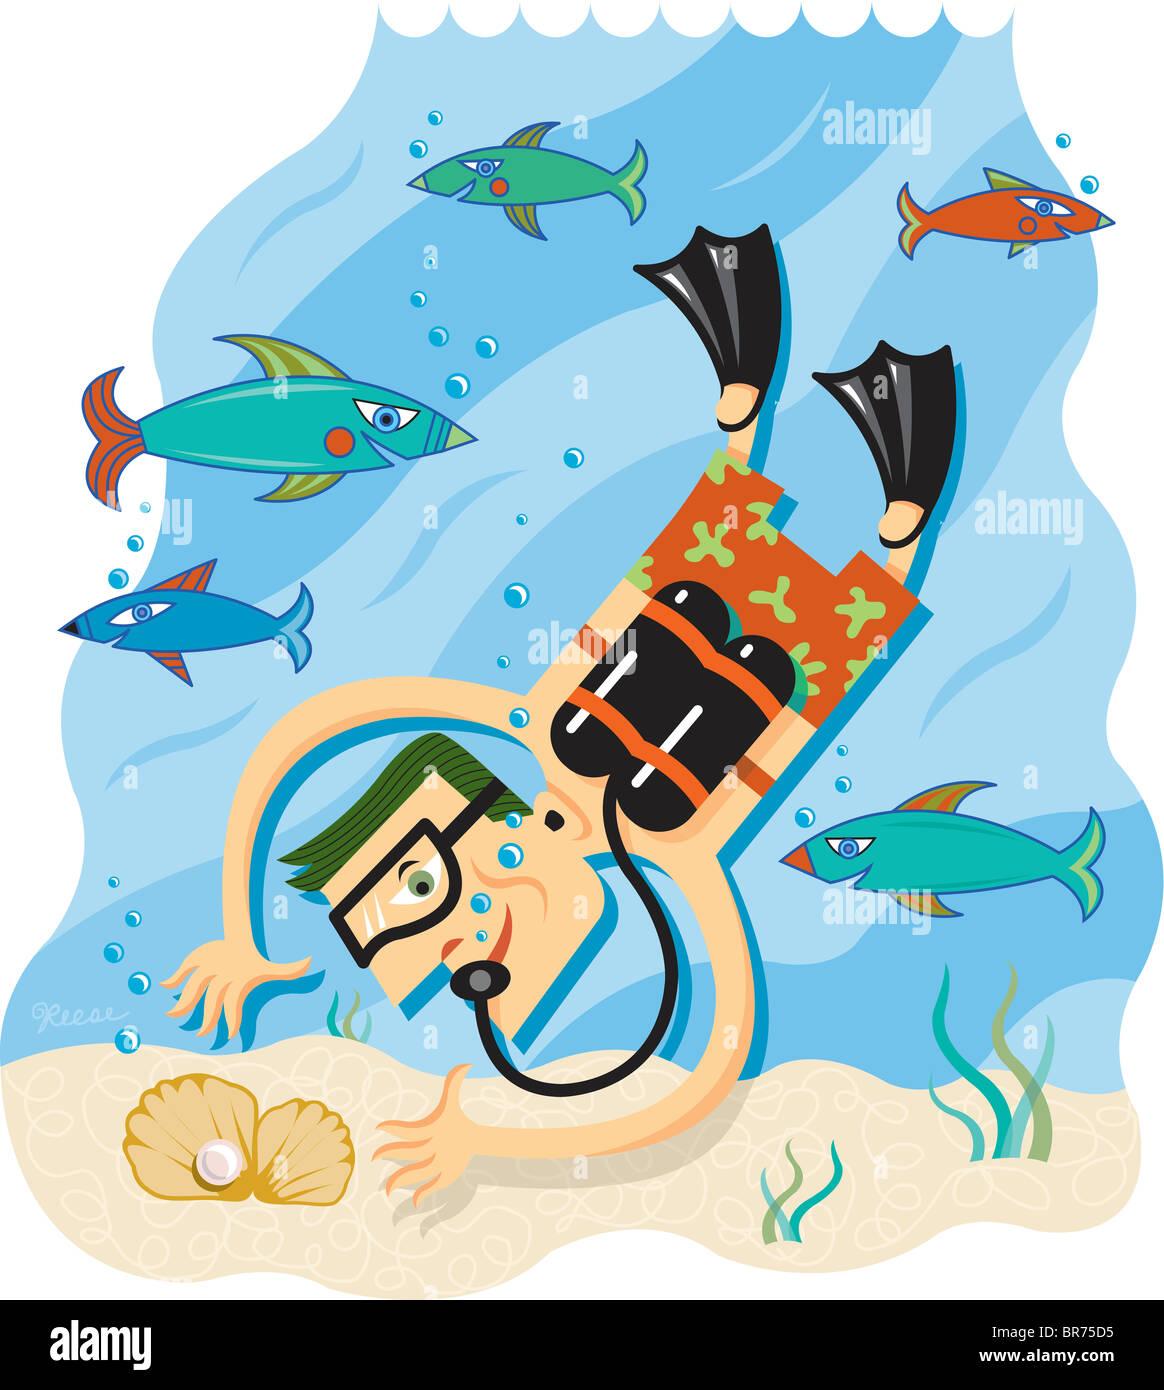 illustration fish drawings aquatic sea stock photos u0026 illustration